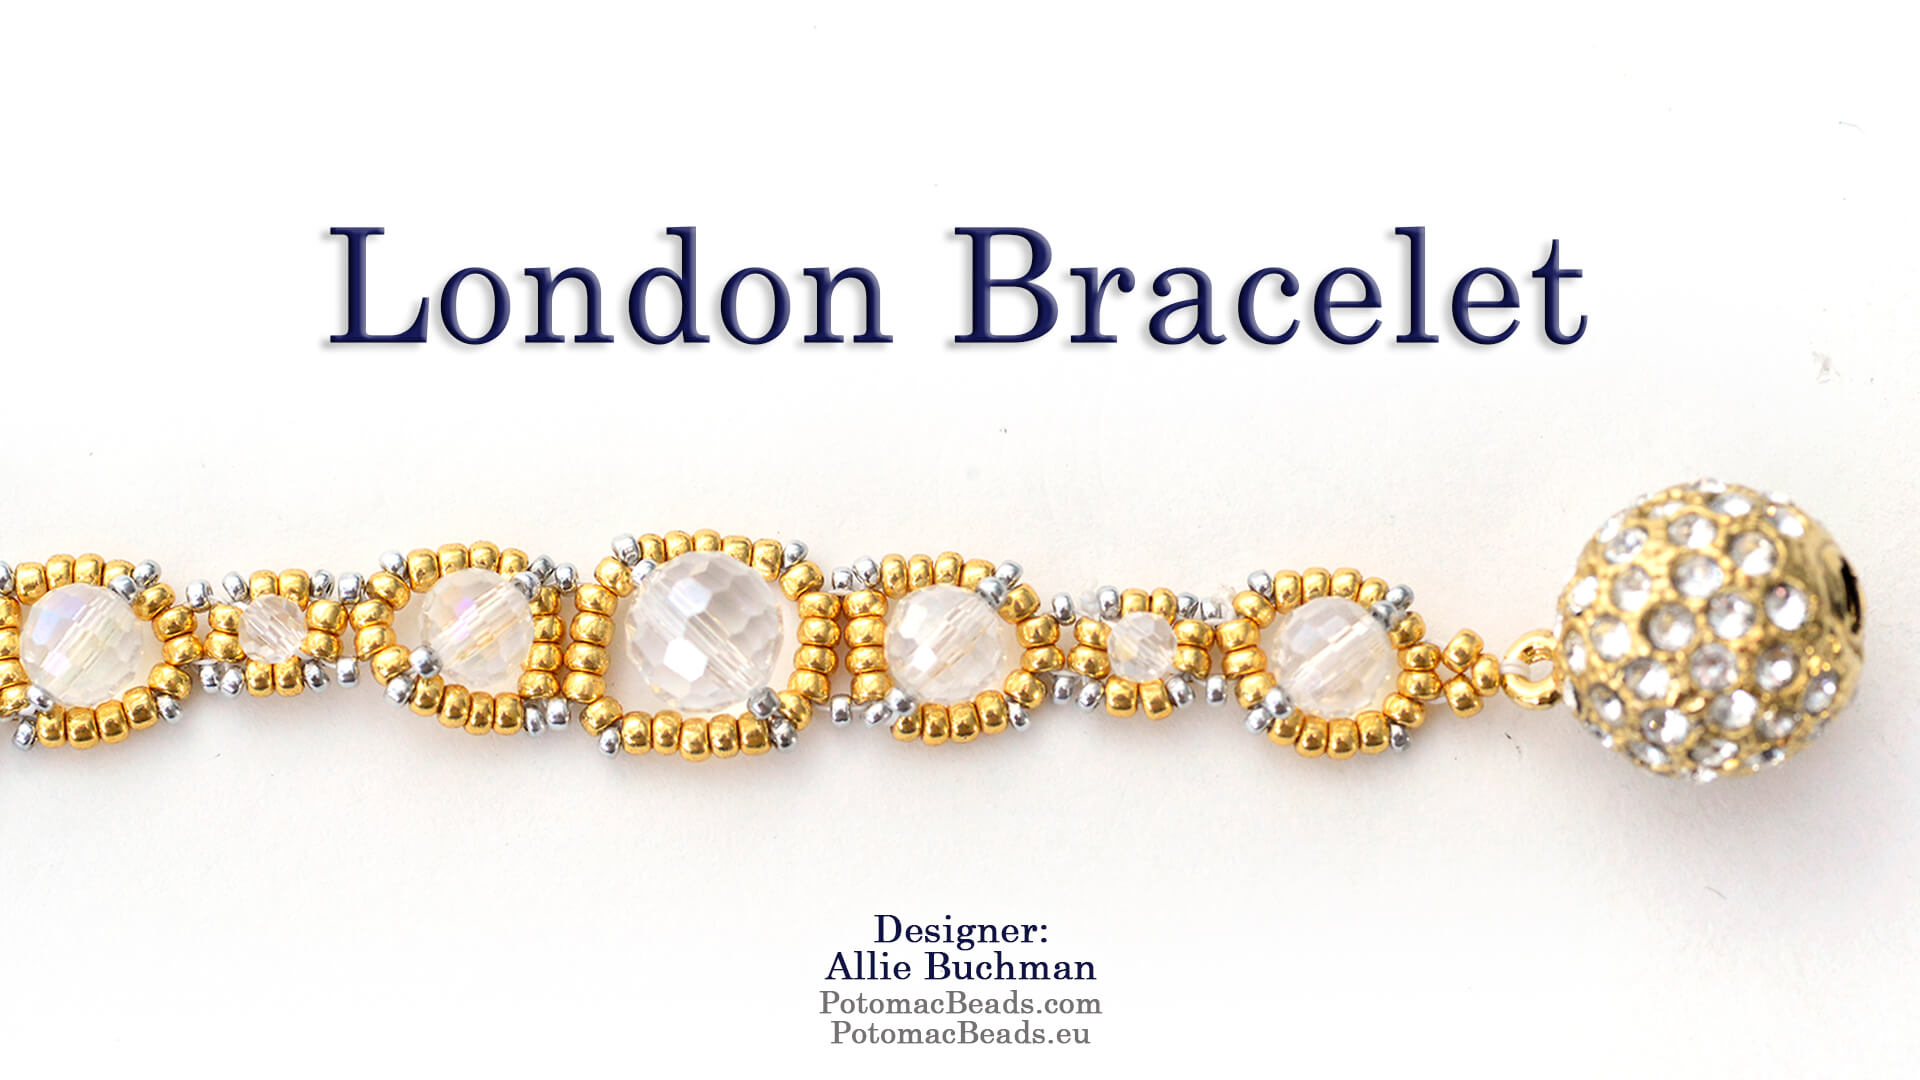 How to Bead Jewelry / Beading Tutorials & Jewel Making Videos / Bracelet Projects / London Bracelet Tutorial